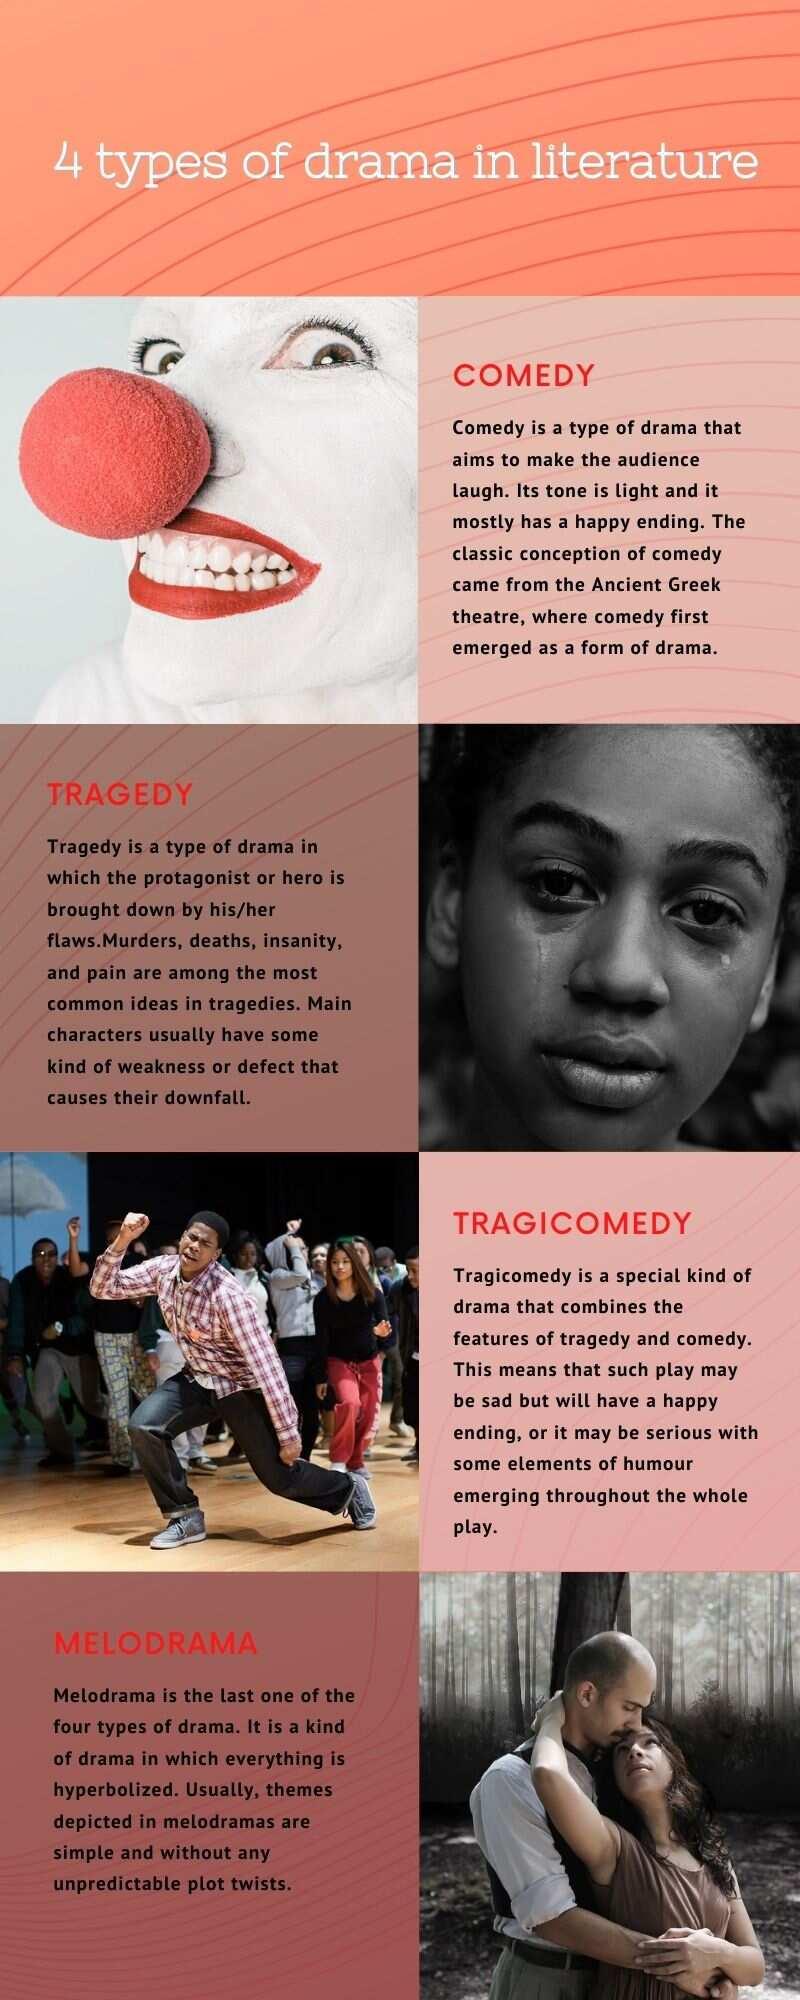 4 types of drama in literature